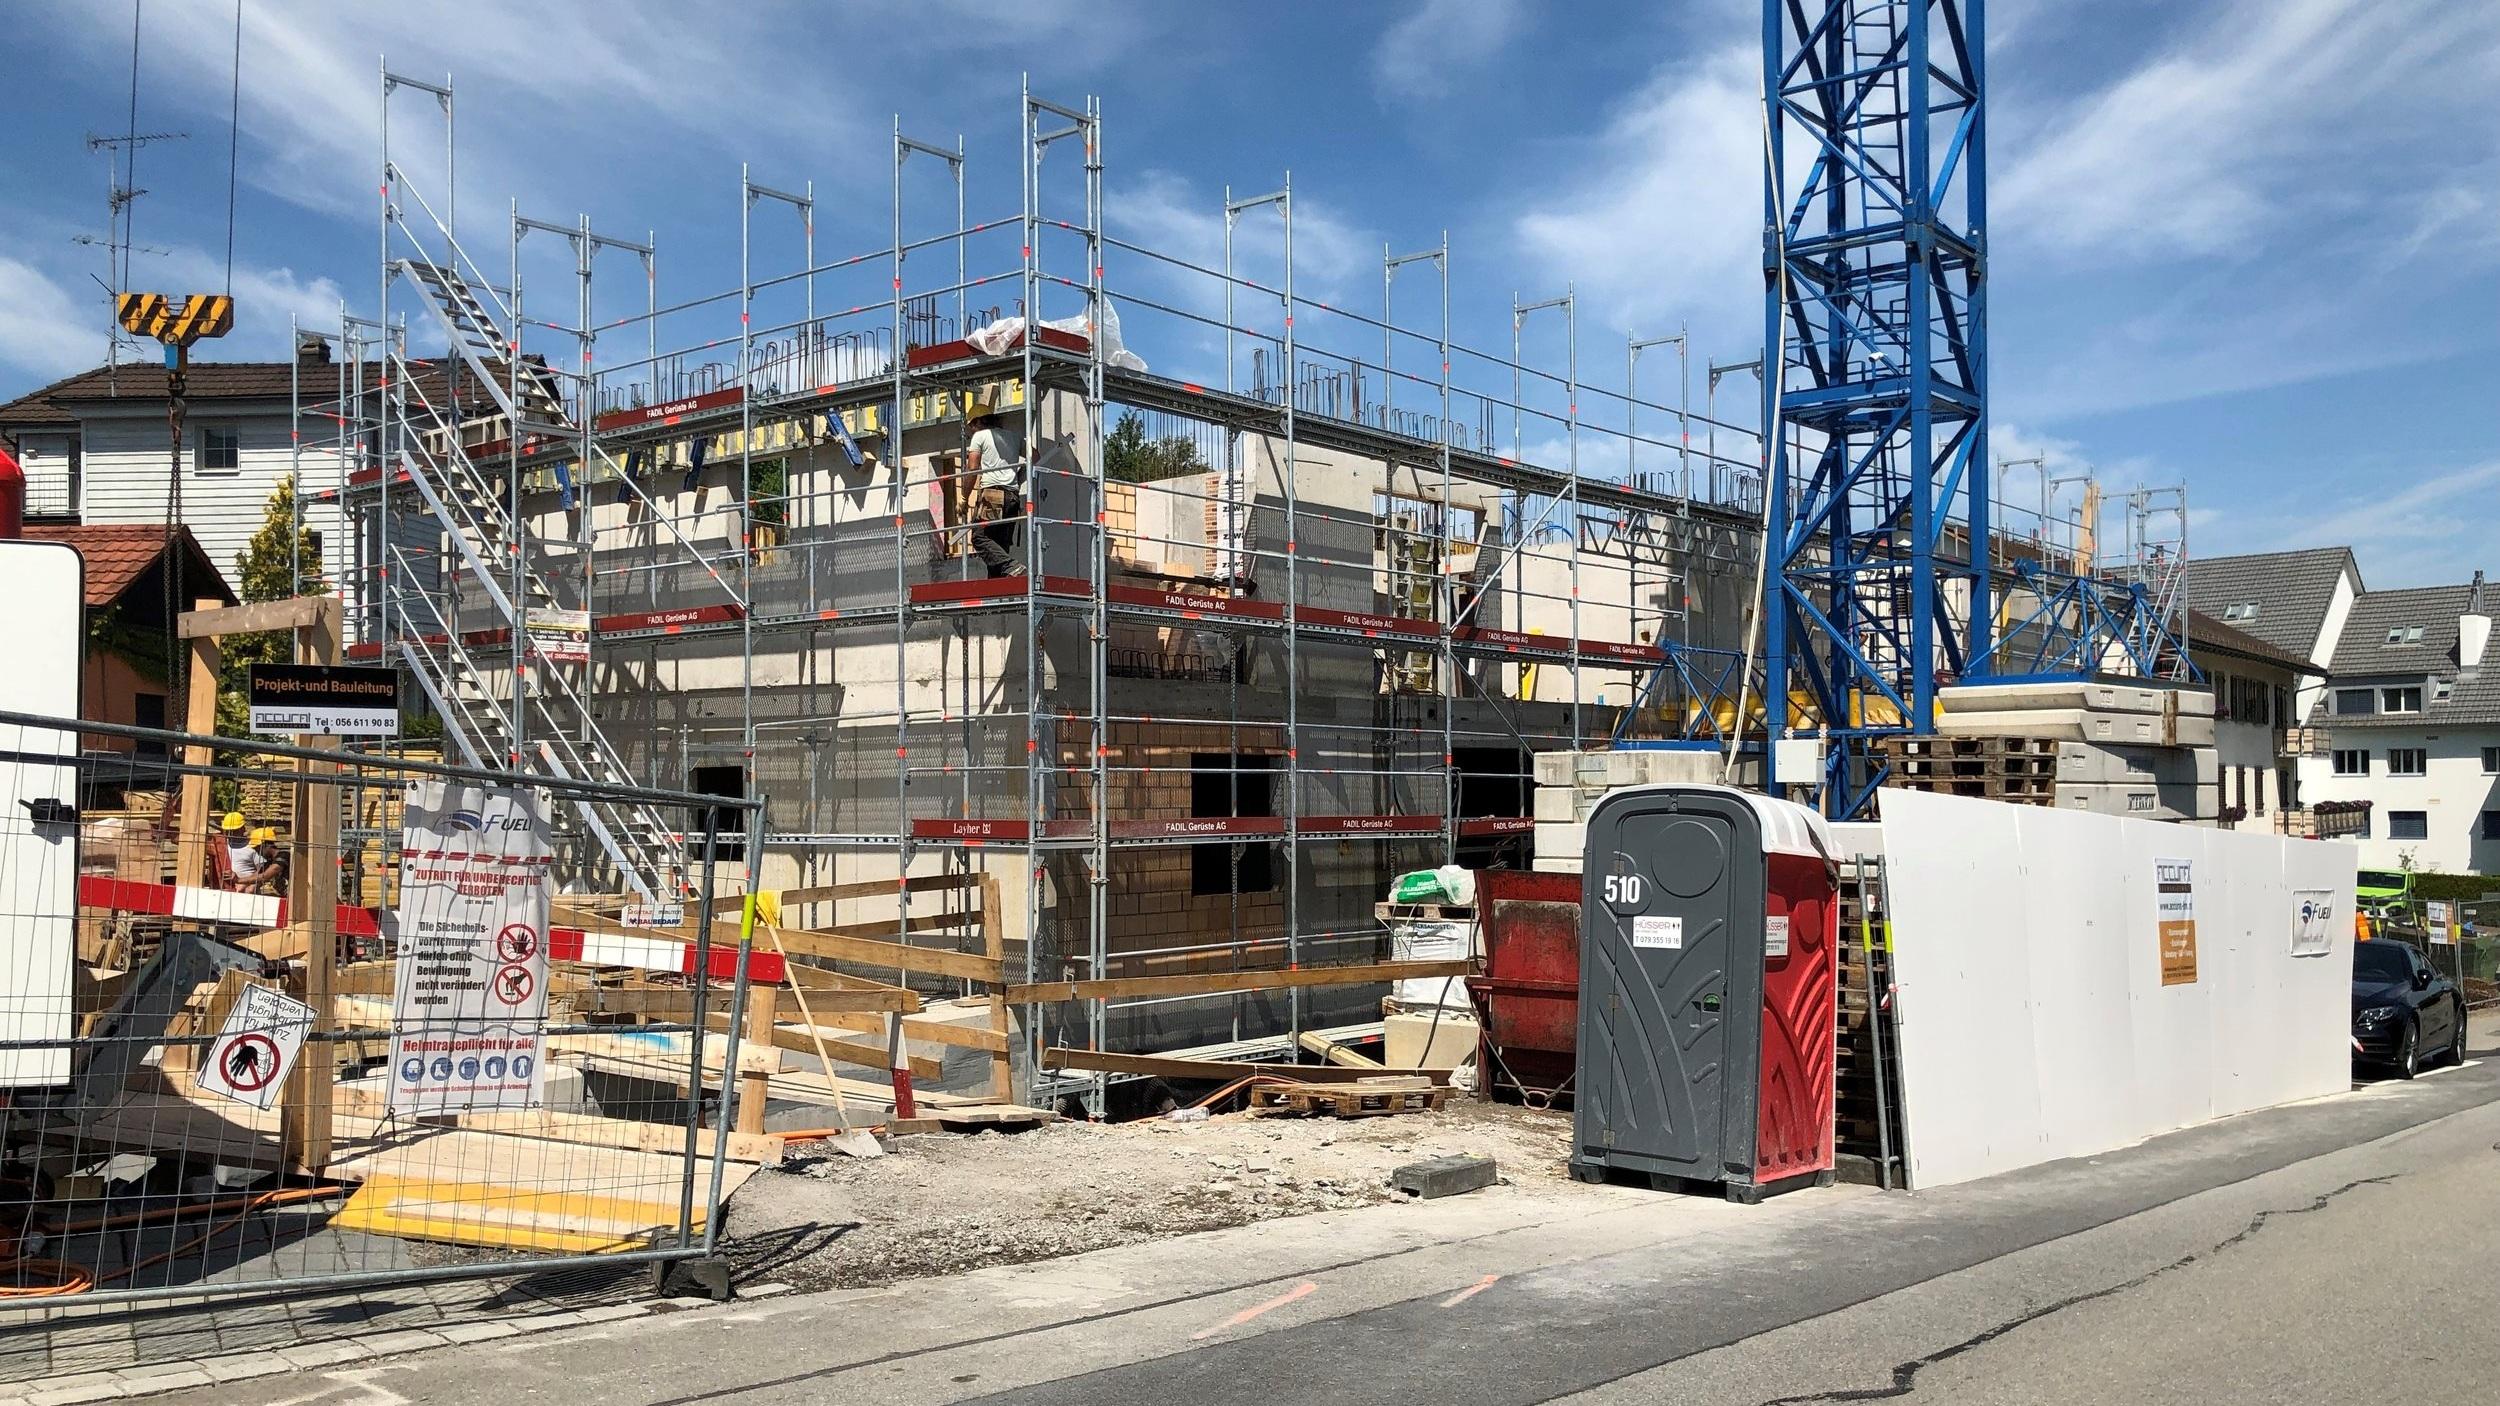 VISIT+-+Baustelle+Neubauprojekt+Boll+Immobilien+Immobilie+Wohnung+Richterswil+verkauft